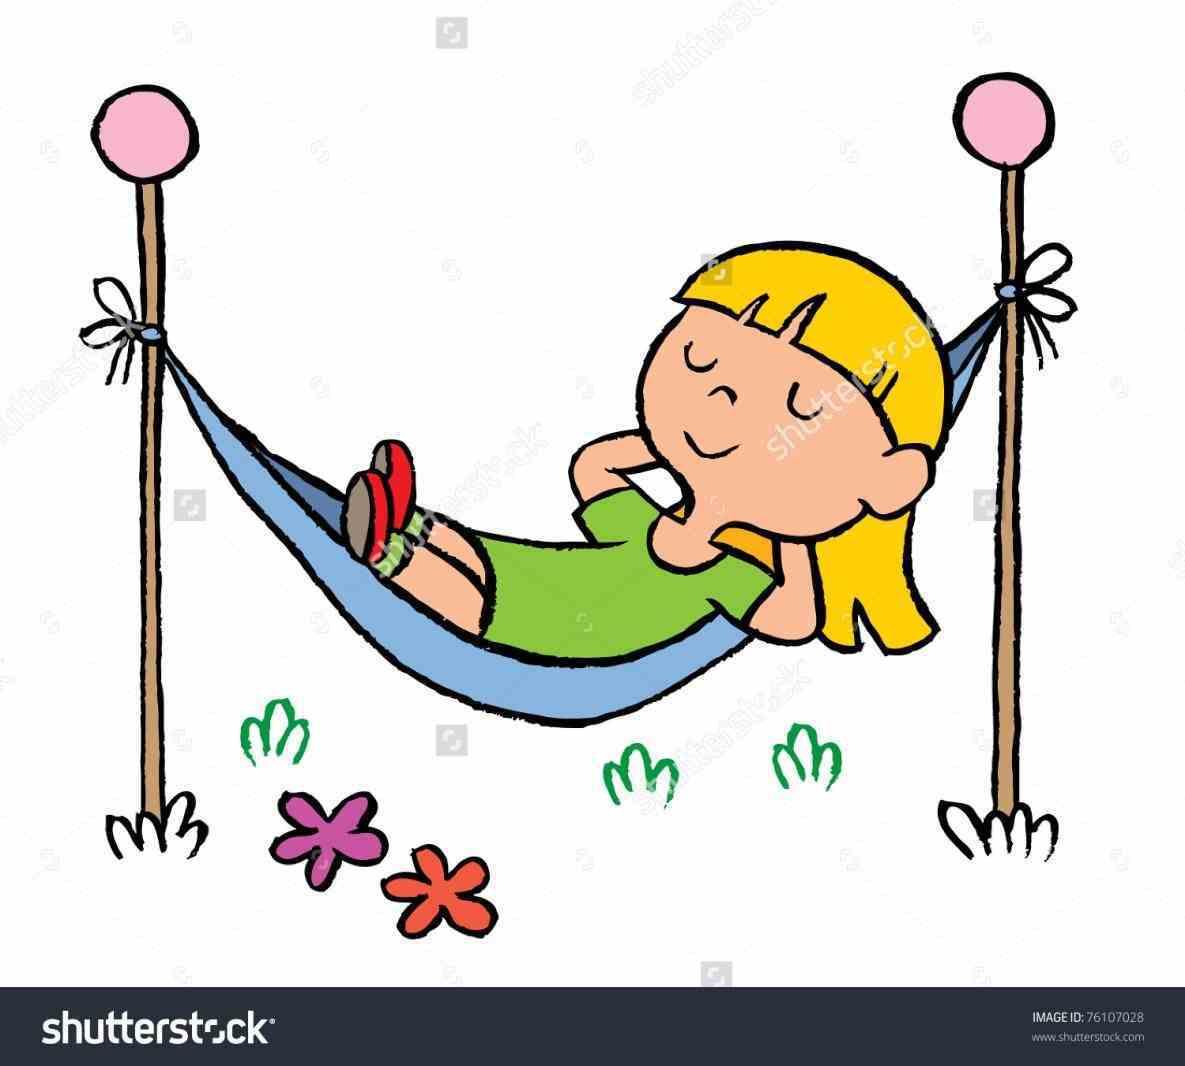 In hammock delightful clip. Relaxing clipart